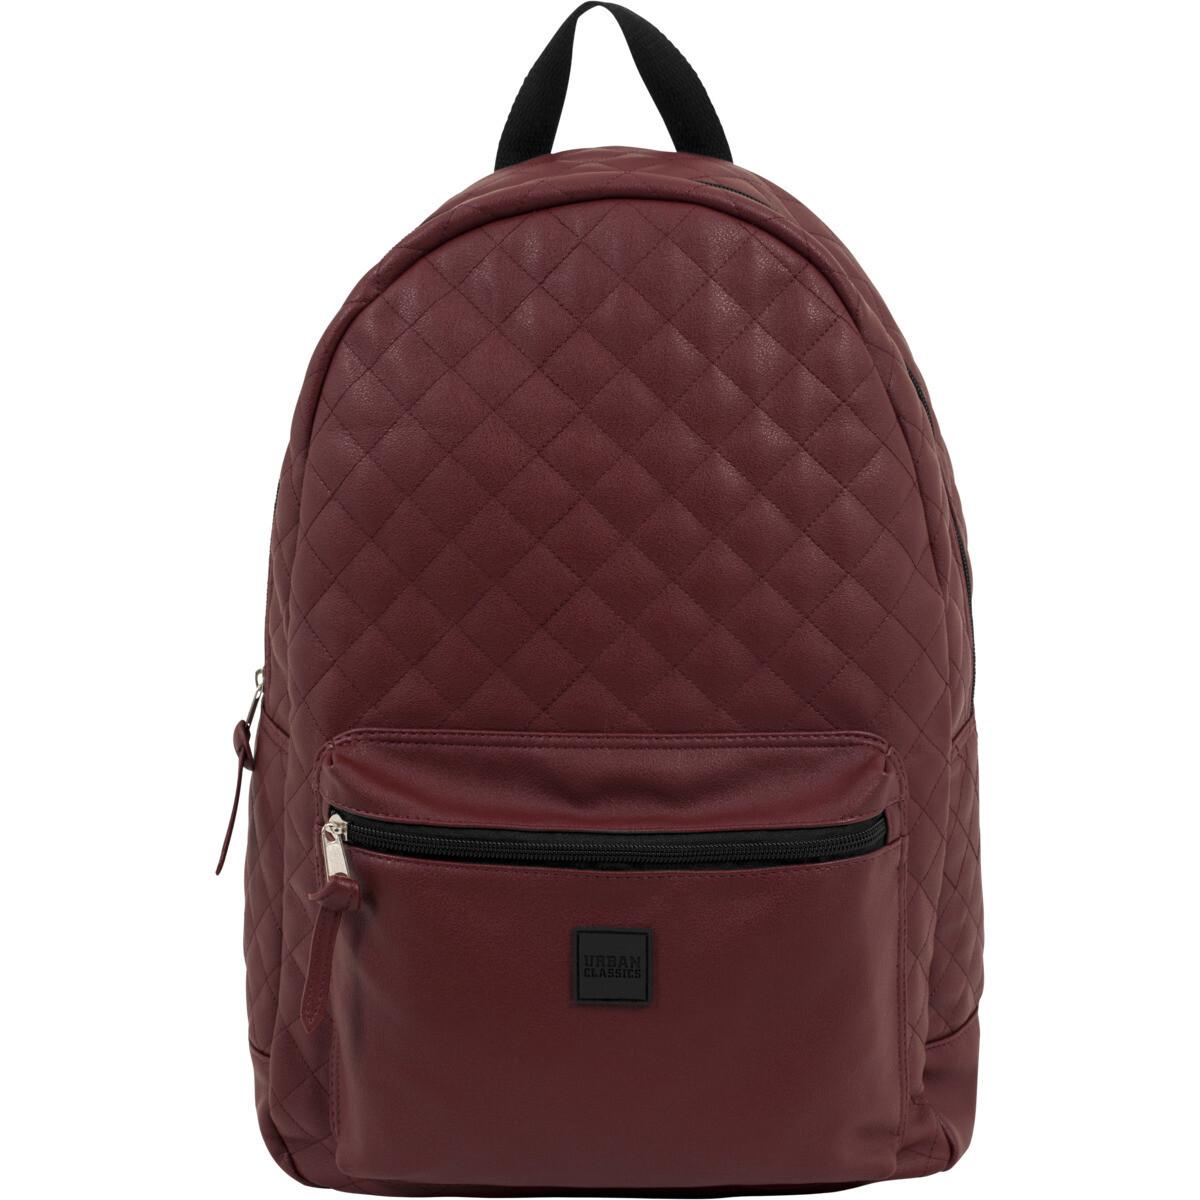 Diamond Quilt Leather Imitation Backpack - Burgundy